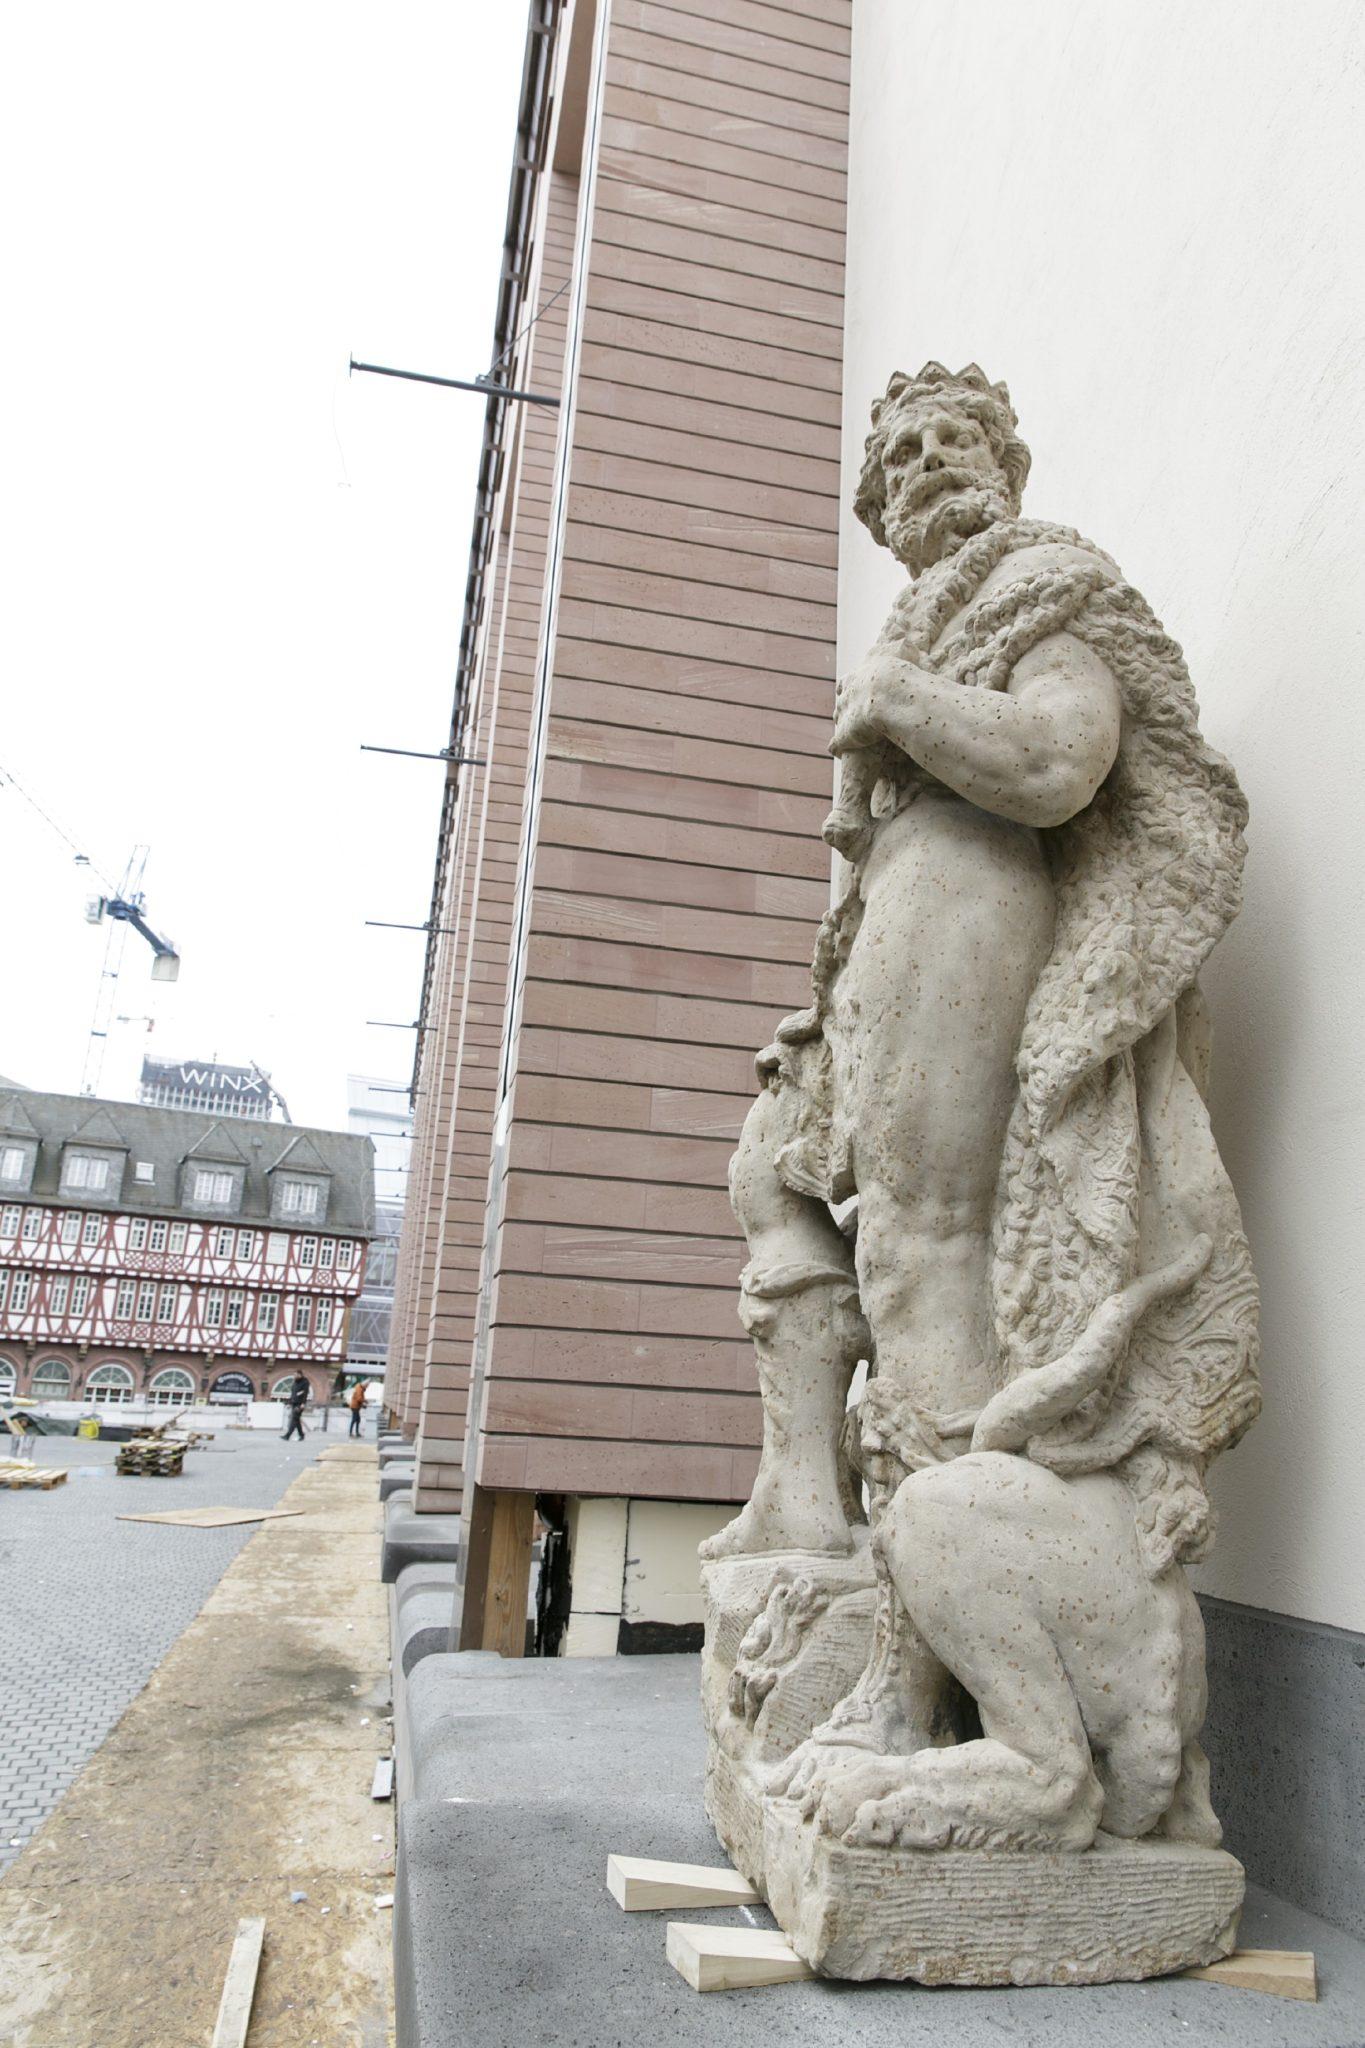 historisches museum frankfurt: Pluto Gott der Hölle. Die Skulpturengalerie-März-2017-©-HMF/S. Koesling